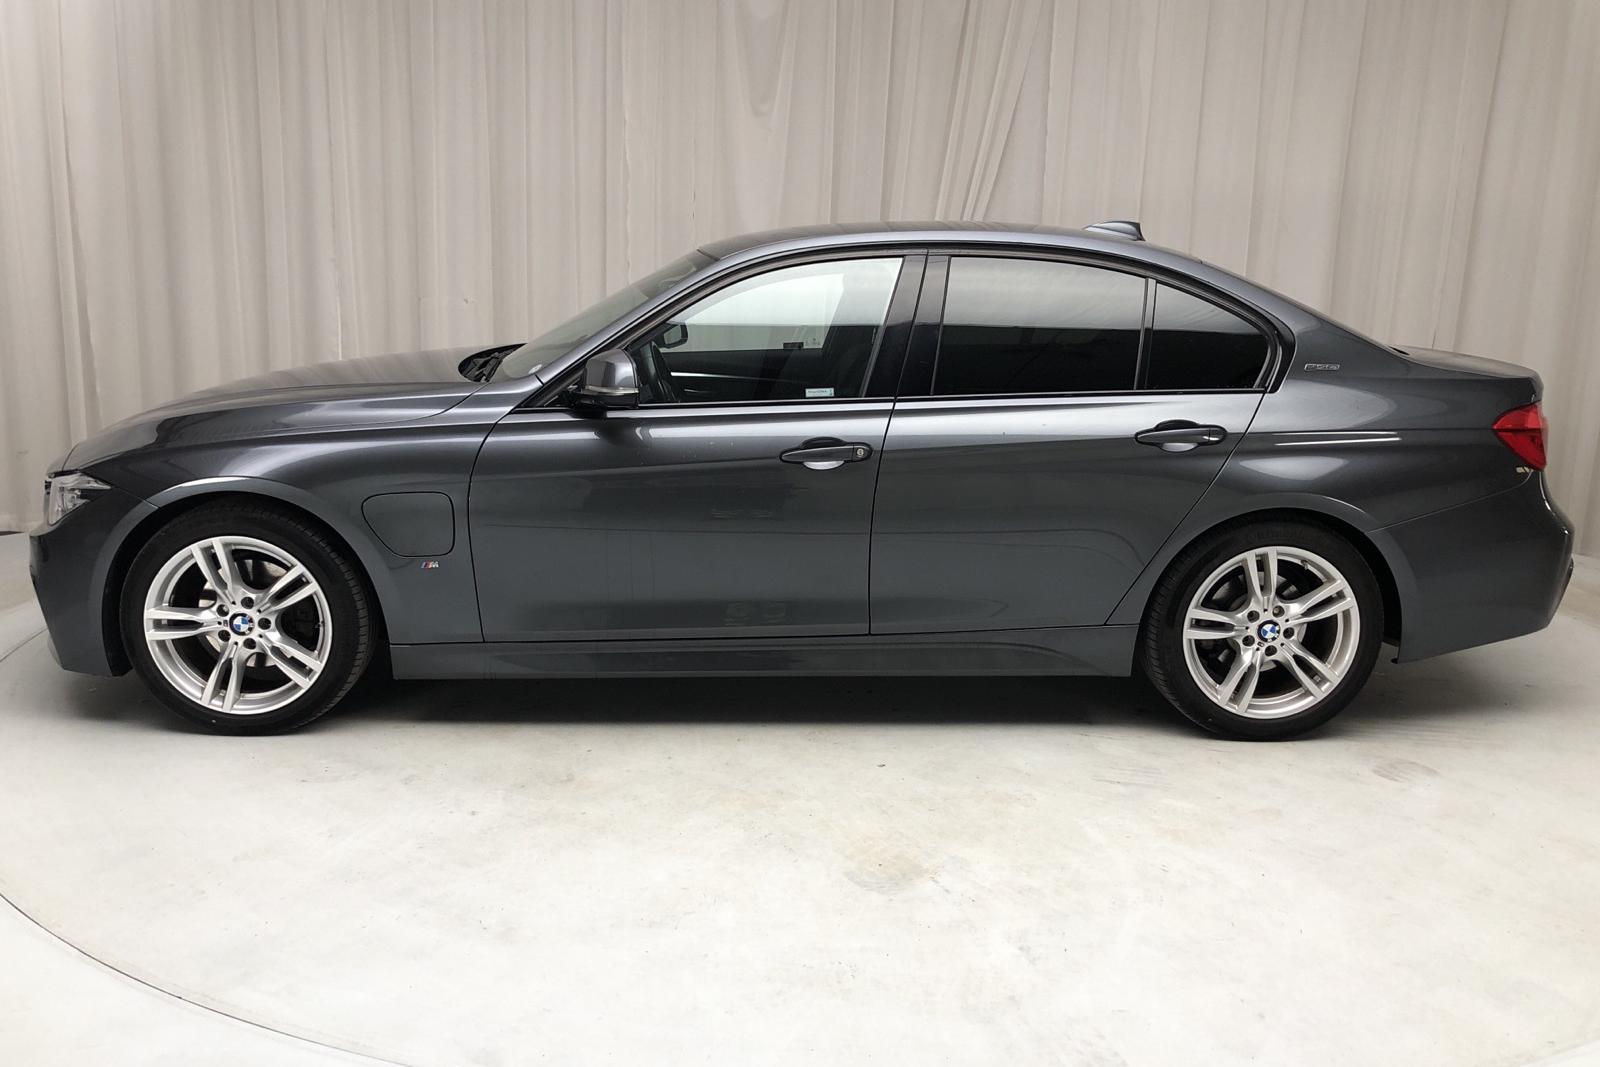 BMW 330e Sedan, F30 (252hk) - 51 689 km - Automatic - gray - 2017